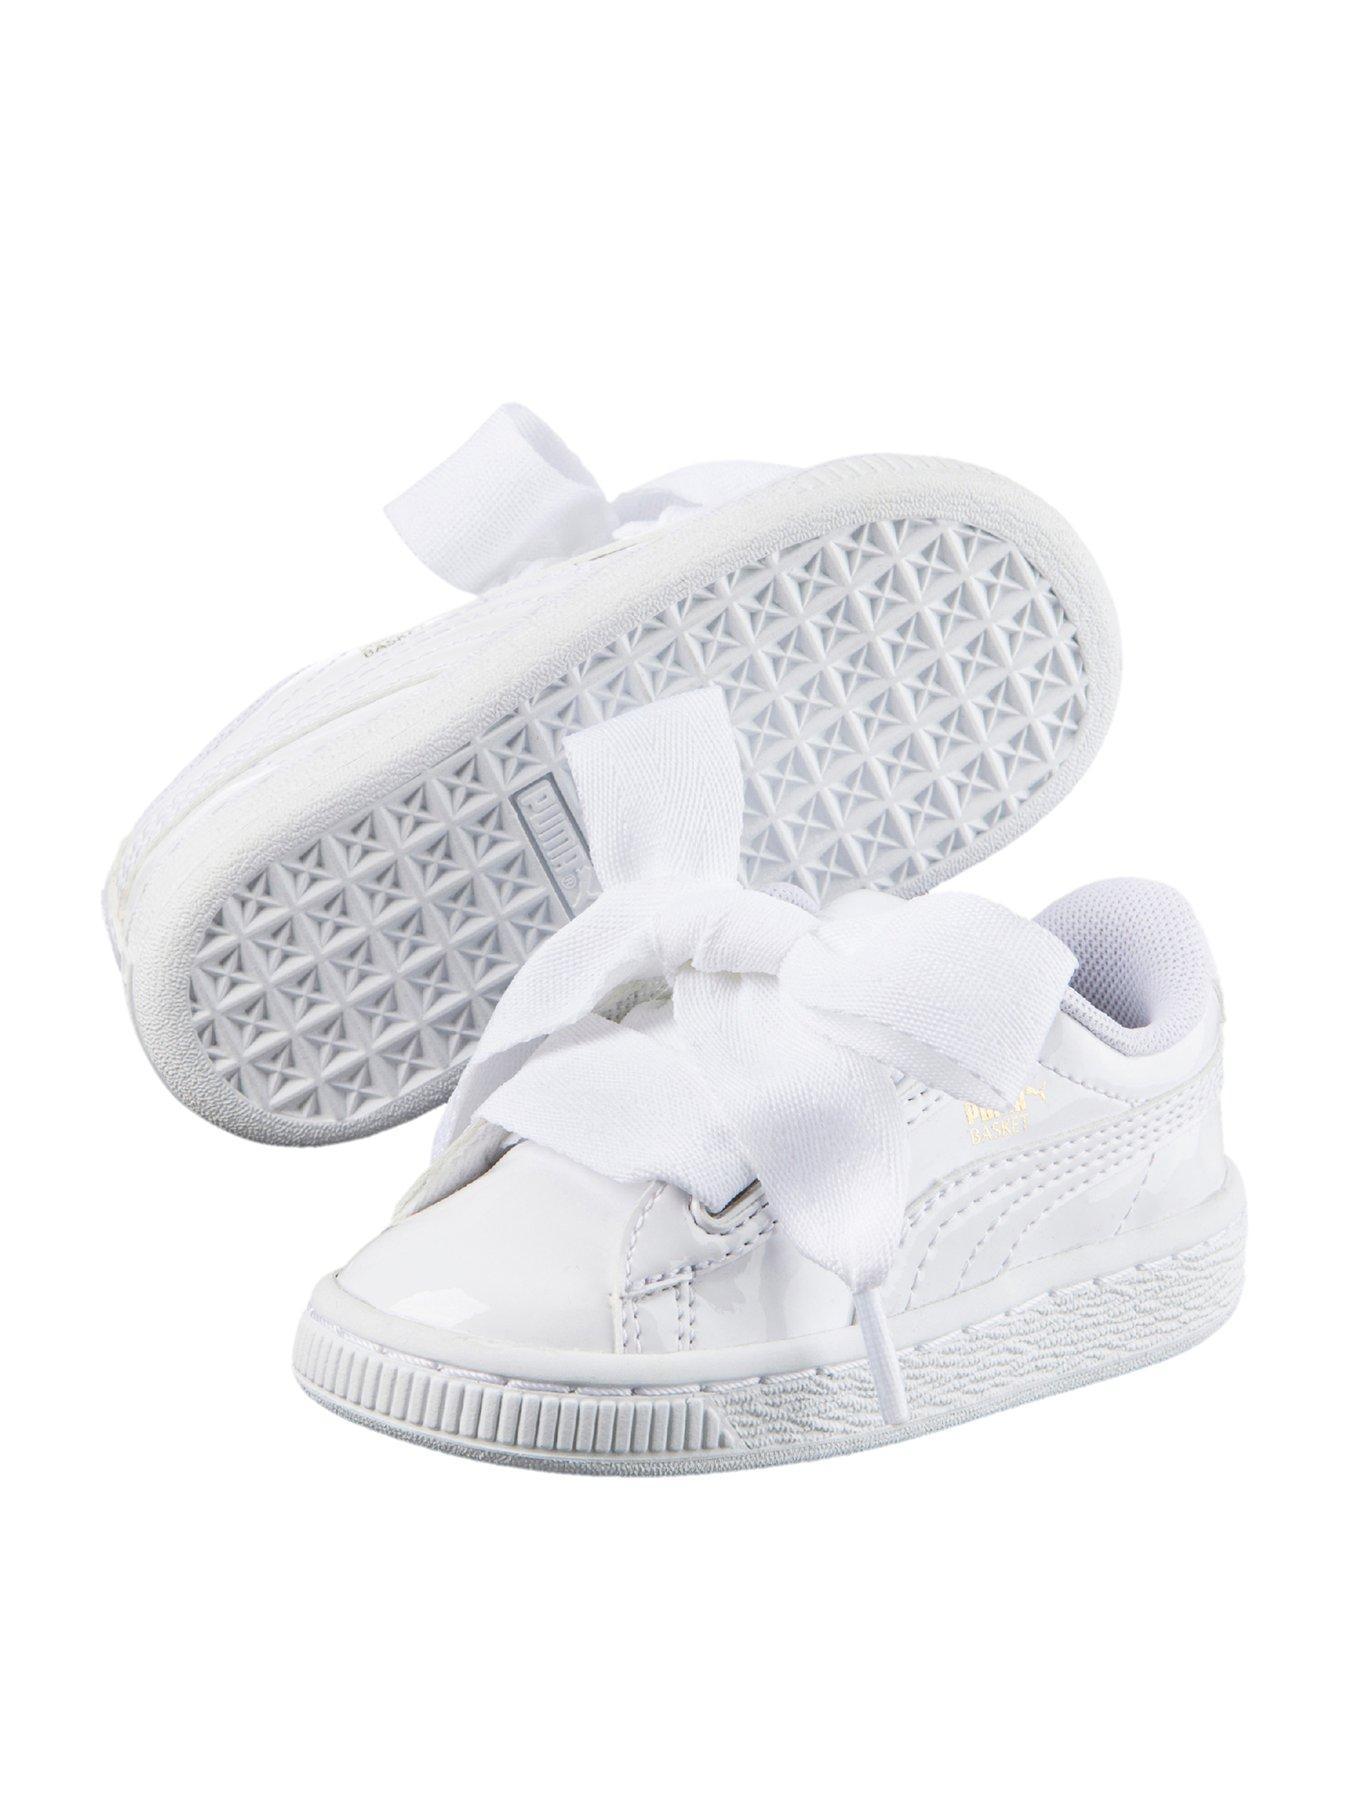 White | Puma | Child \u0026 baby | www